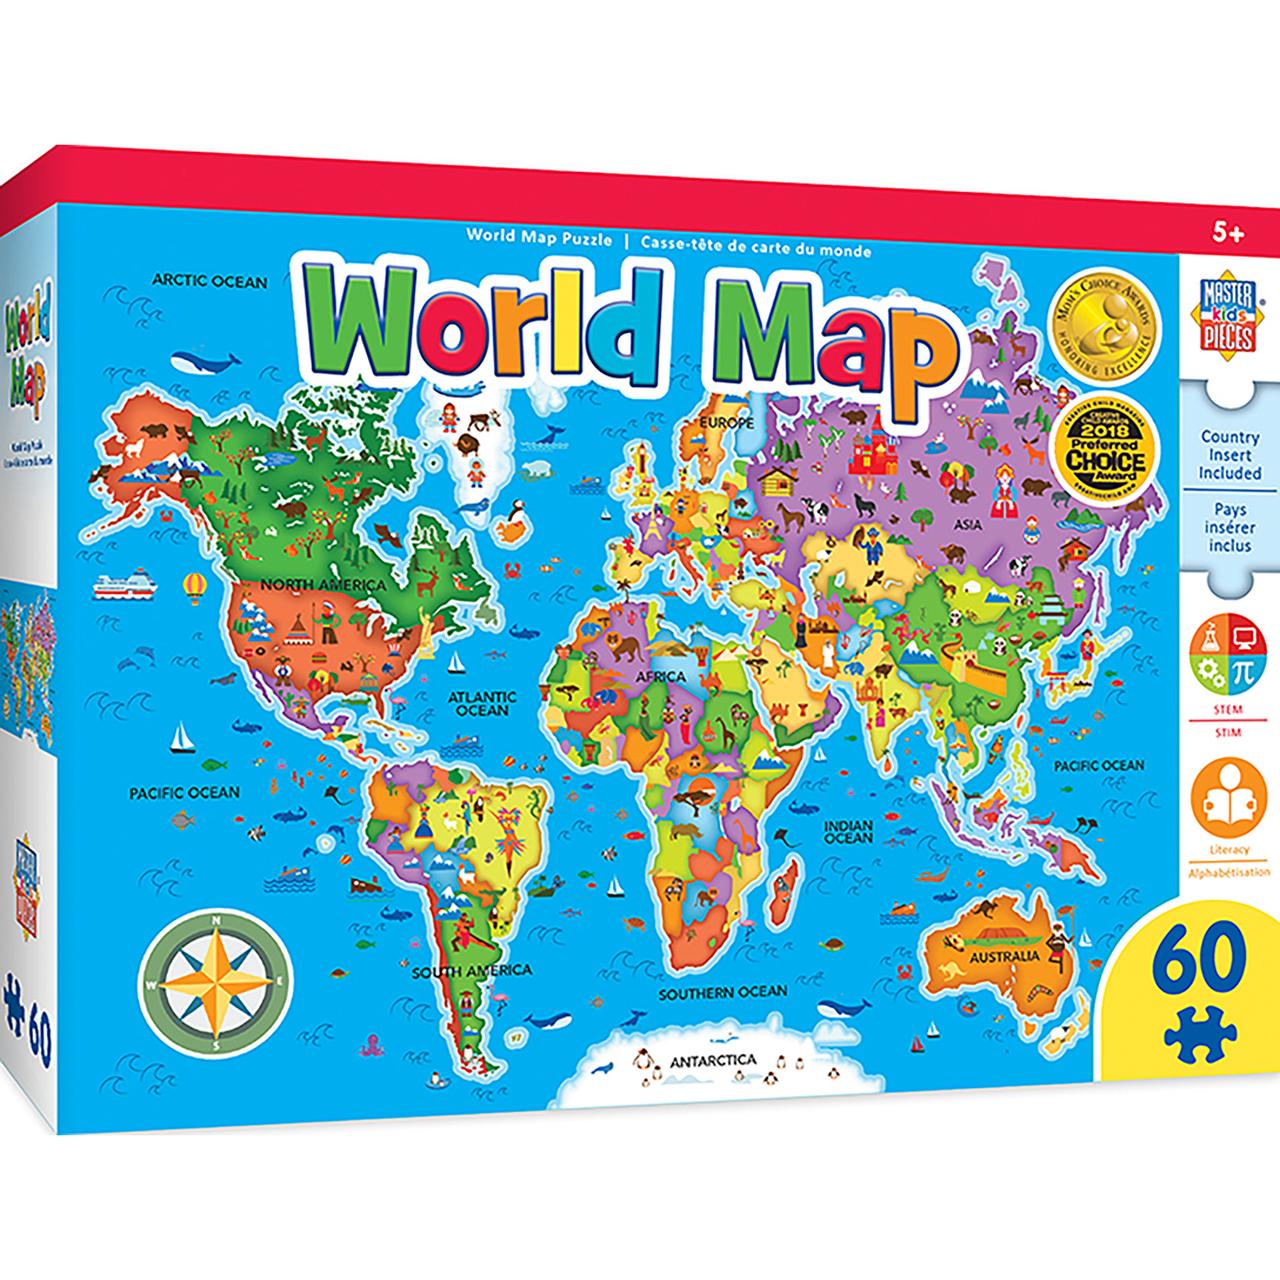 EDUCATIONAL MAPS - WORLD MAP 60 PIECE JIGSAW PUZZLE